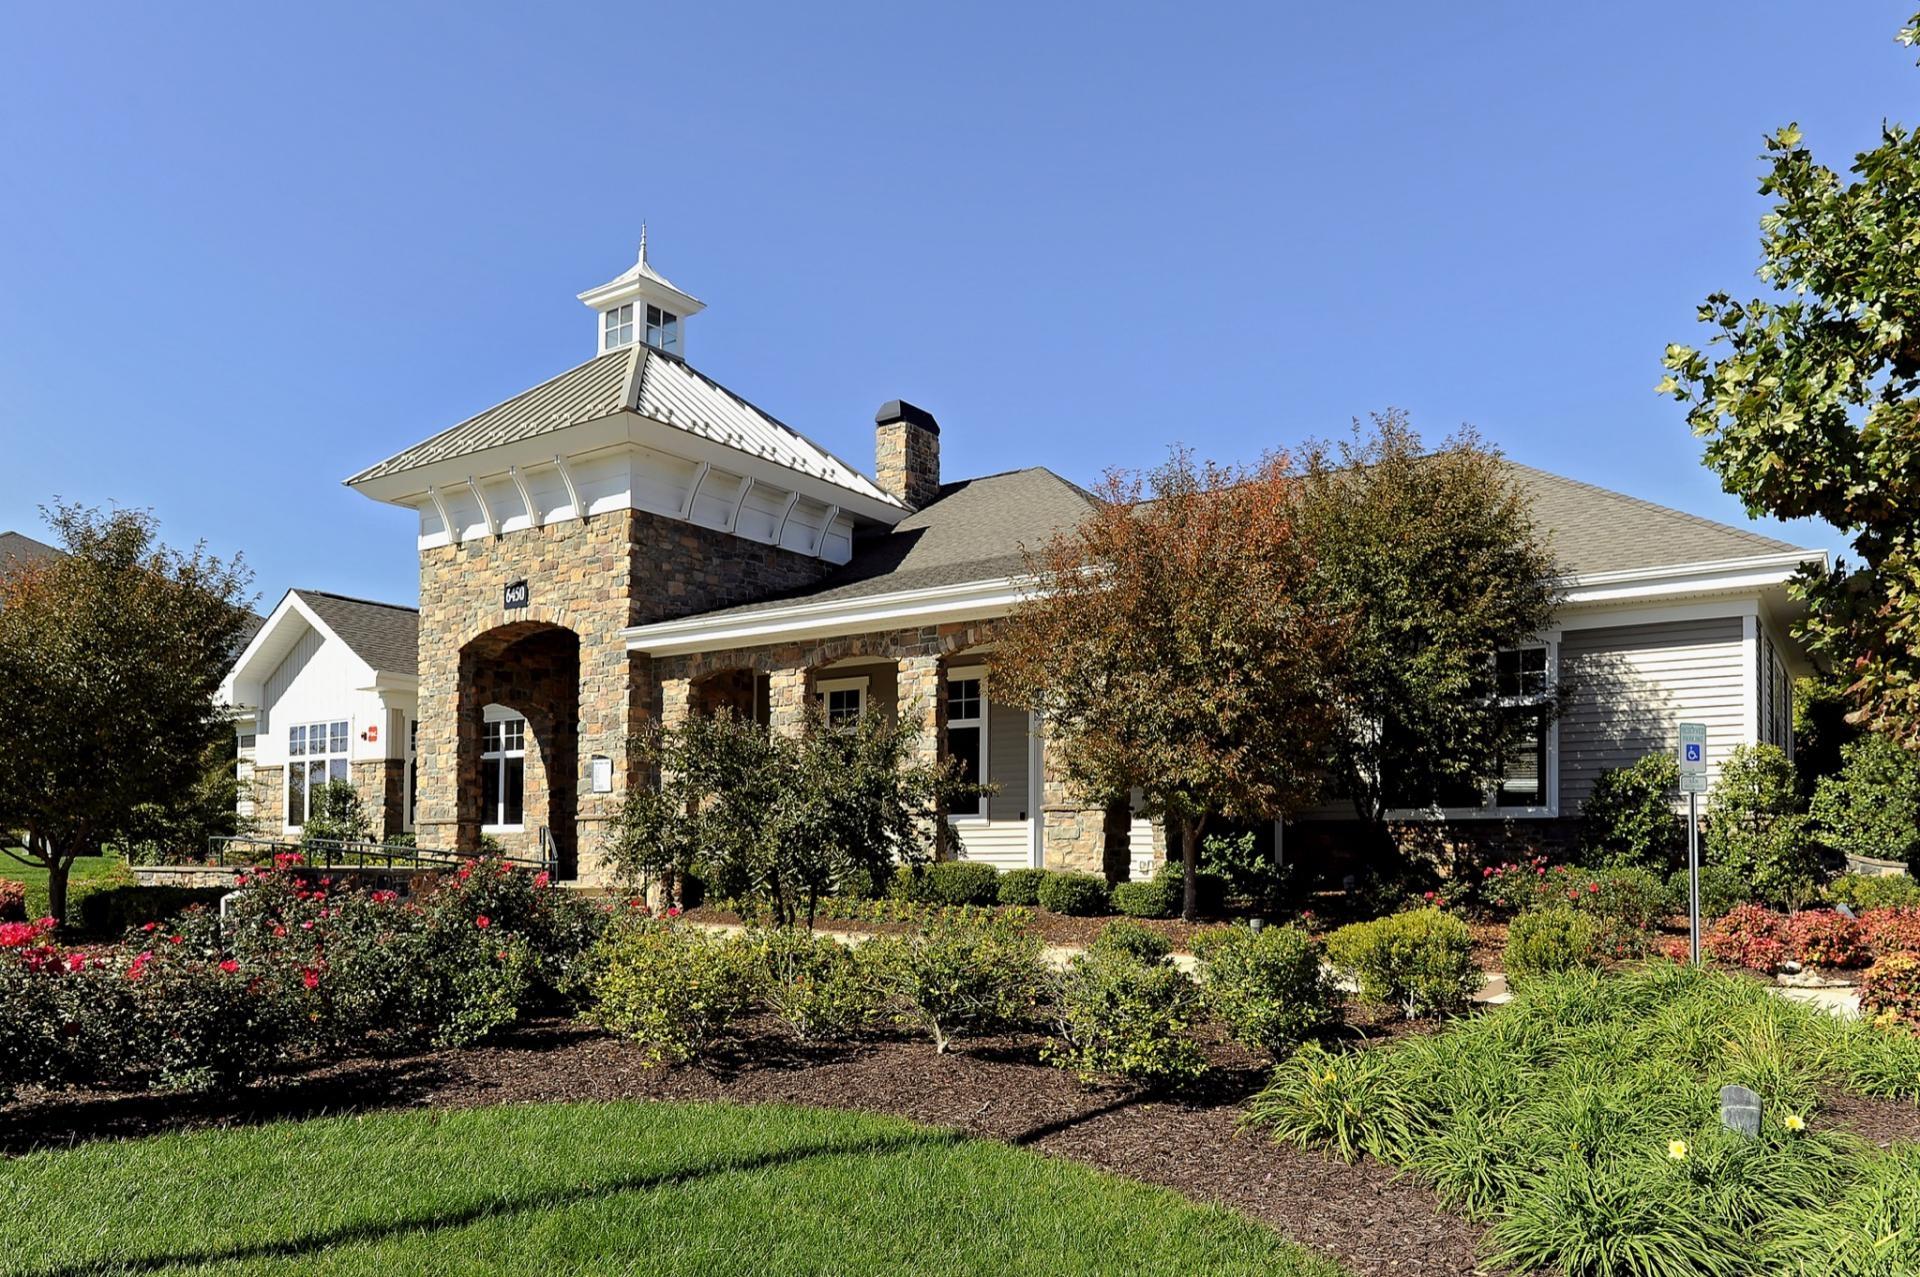 The Sater Design Collection sater designs | design homes home design ideas,camden